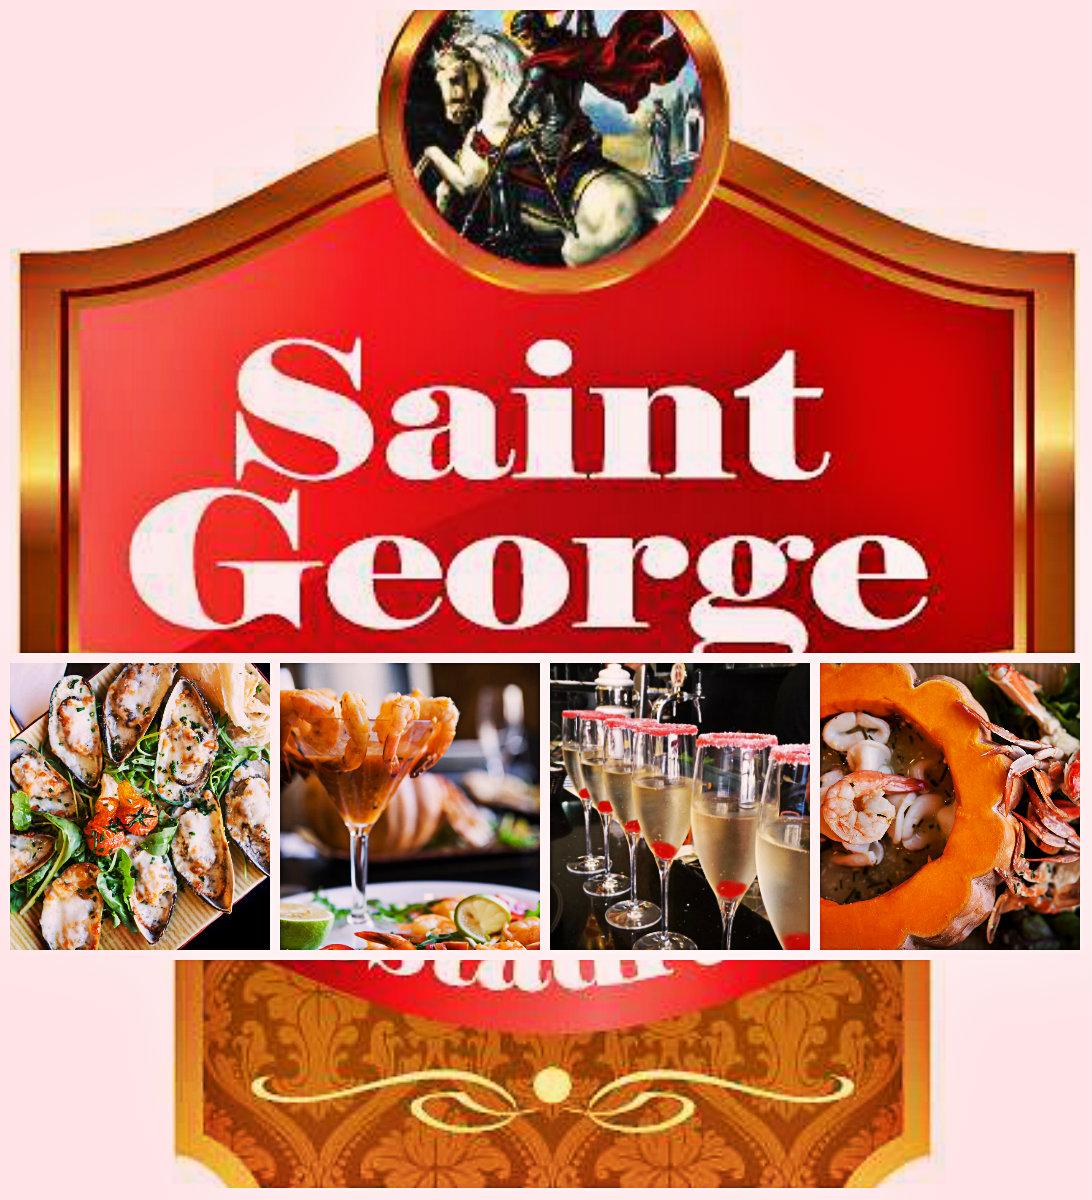 А в ресторане «Saint George» готовит не повар, а художник…